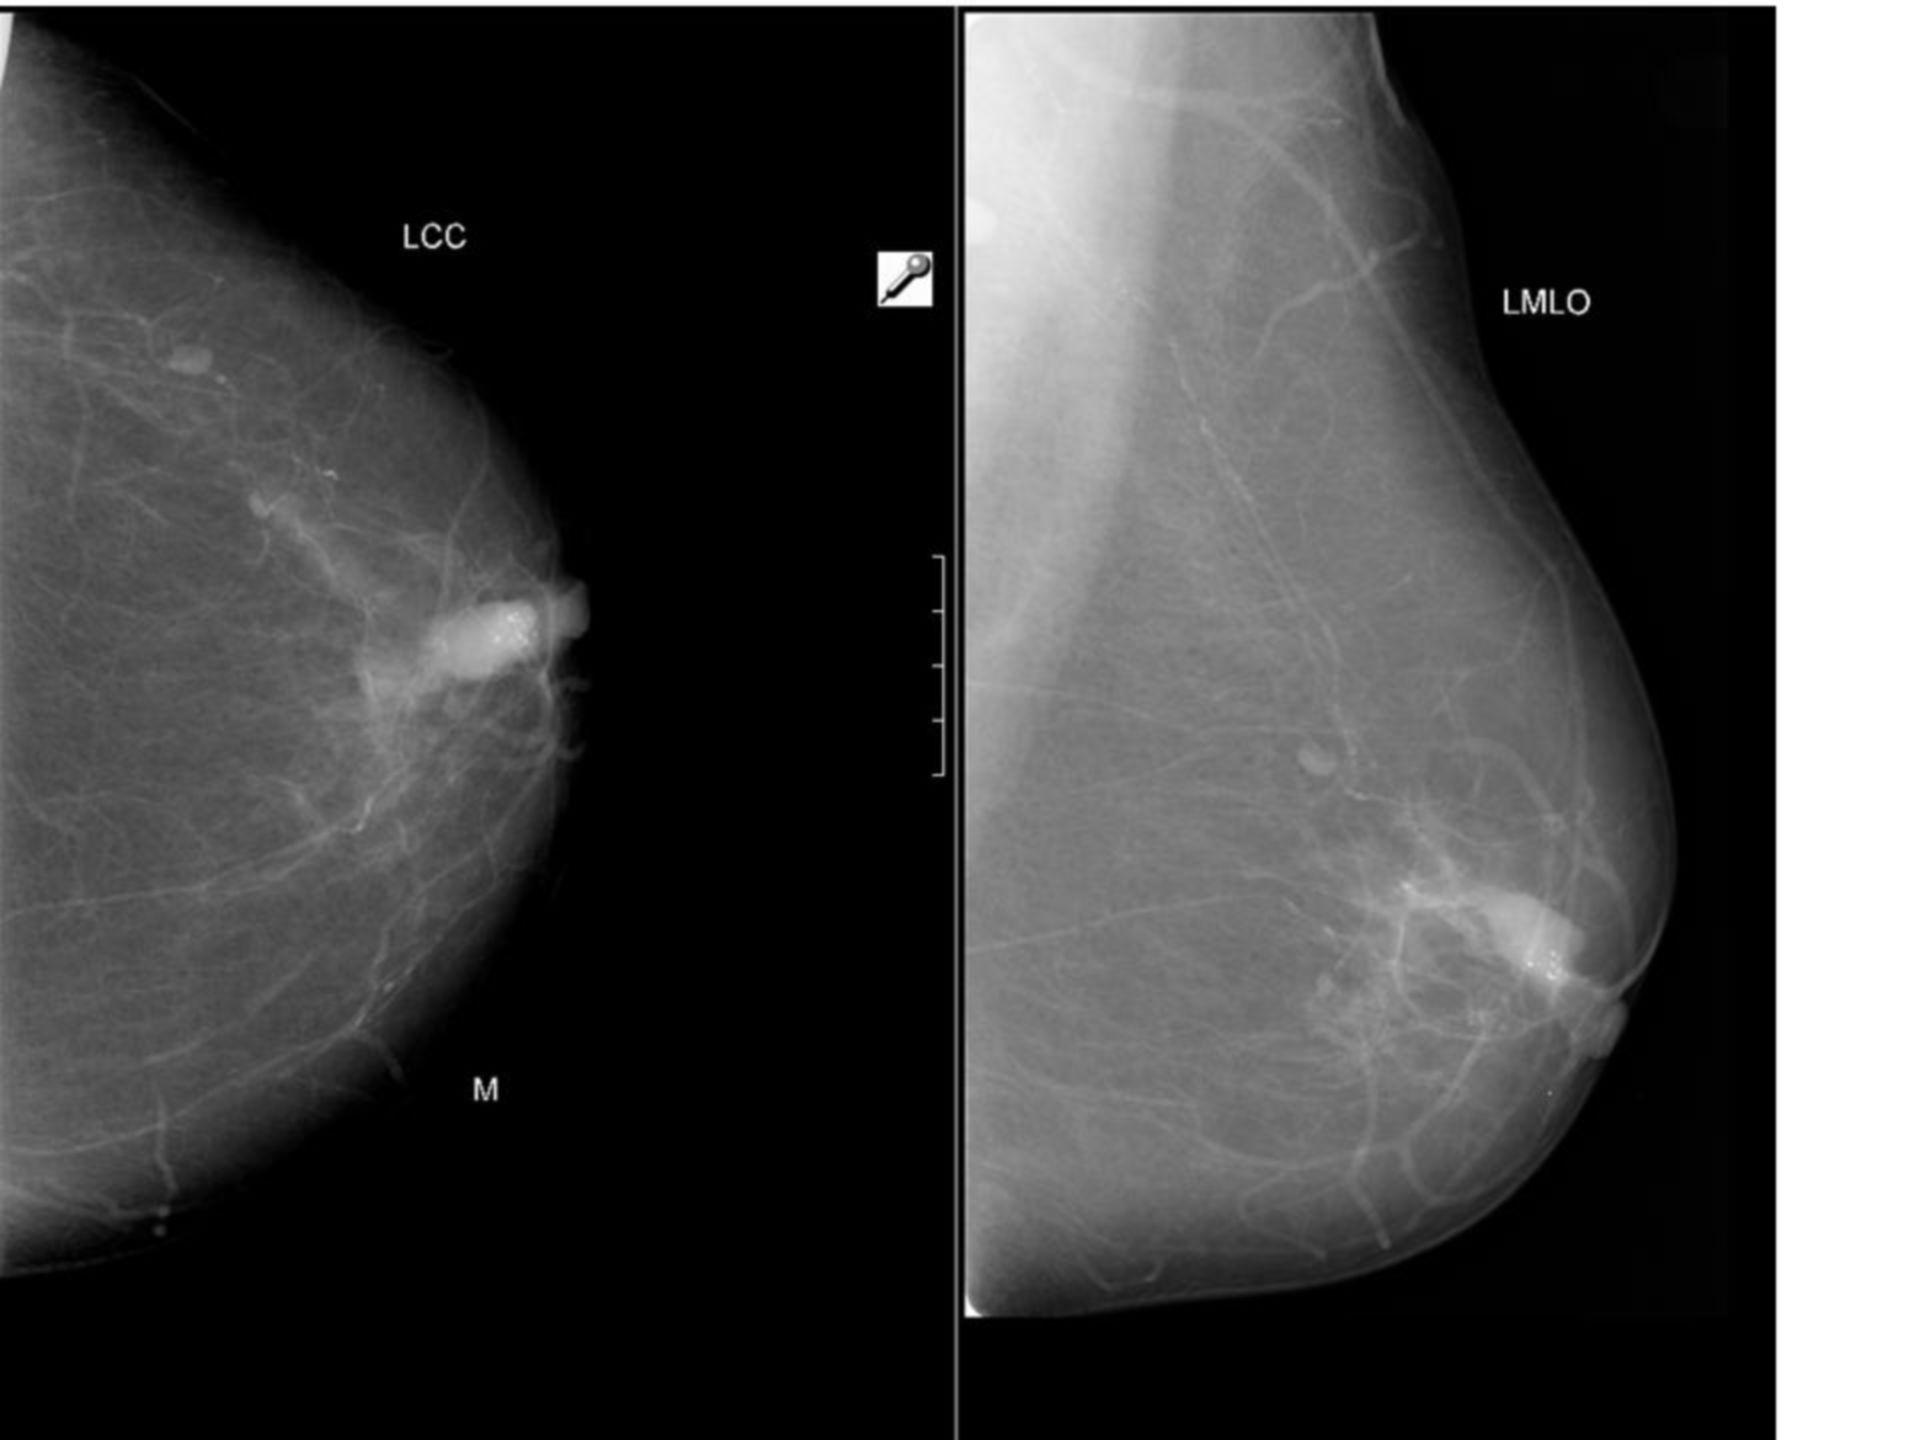 Carcinoma intraduttale